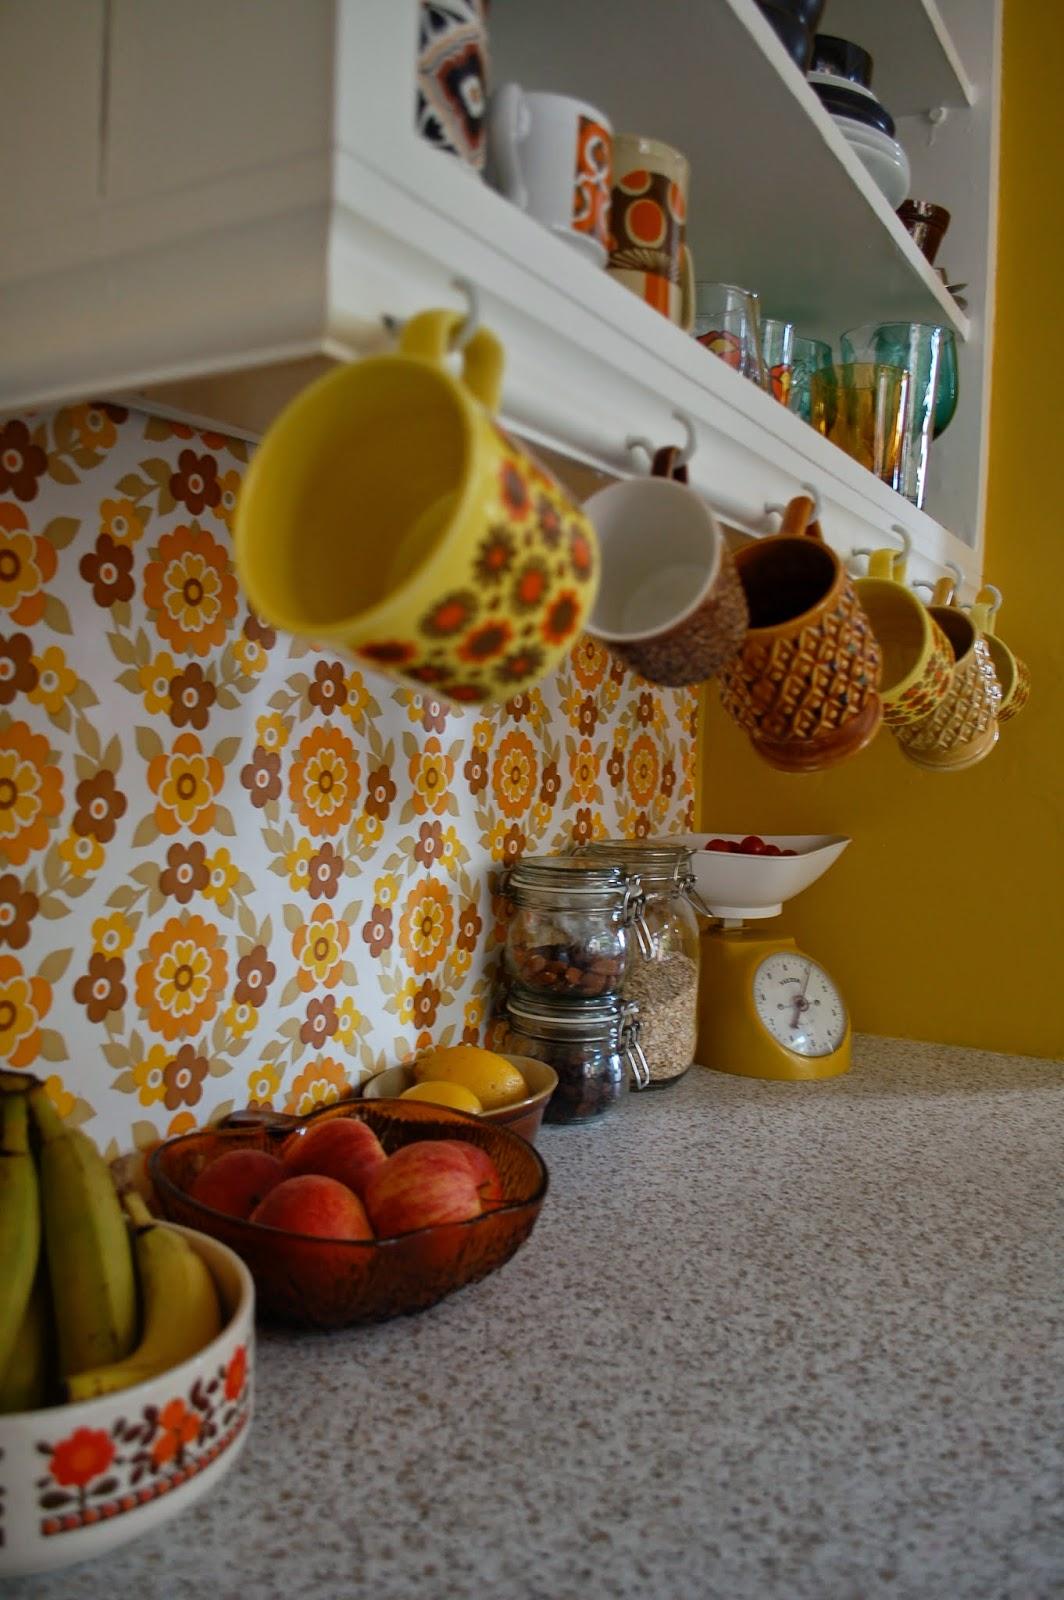 orange kitchen wallpaper vintage clocks hey homewrecker ta tah the finished